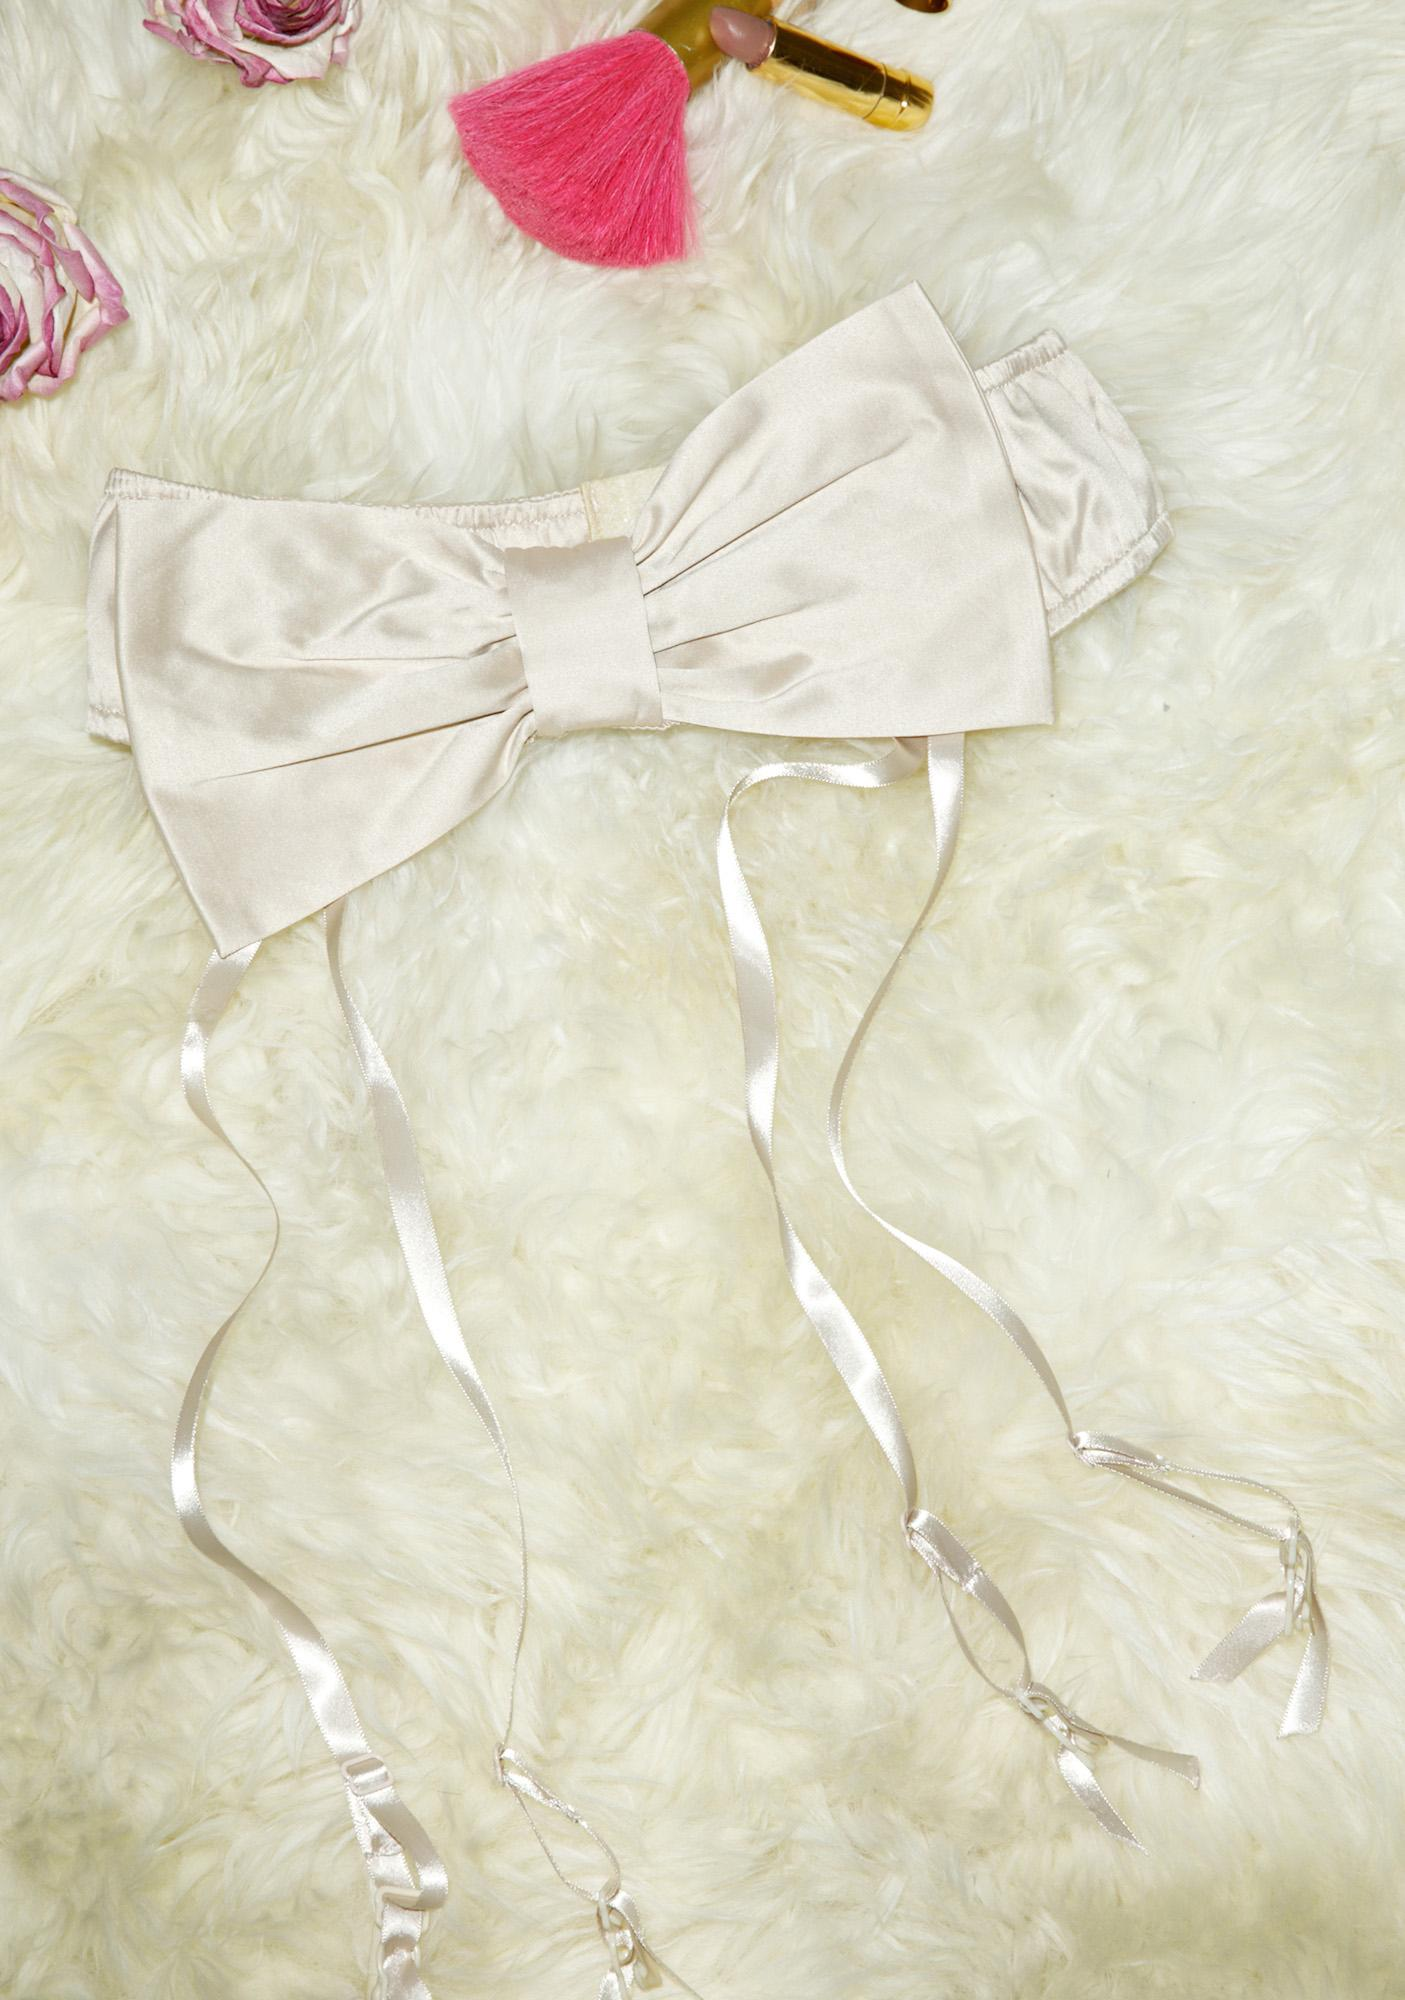 Fete Cupids Bow Garter